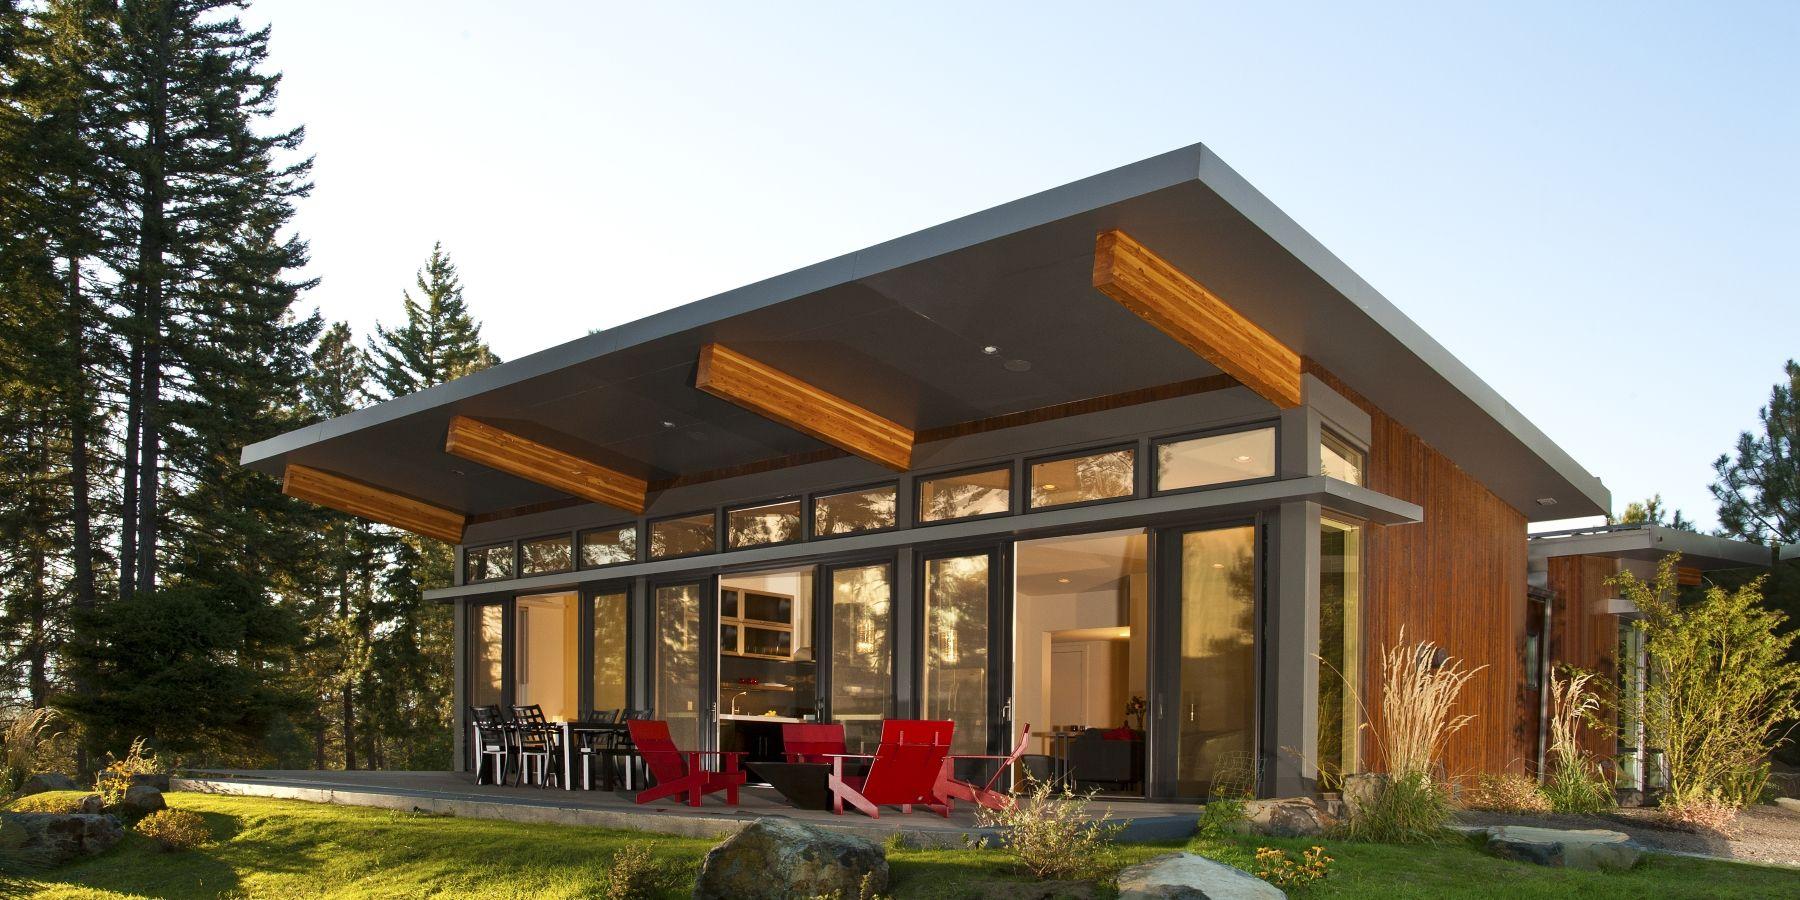 Modern Prefabs Is A Database Of Modern Prefab Homes And Modern